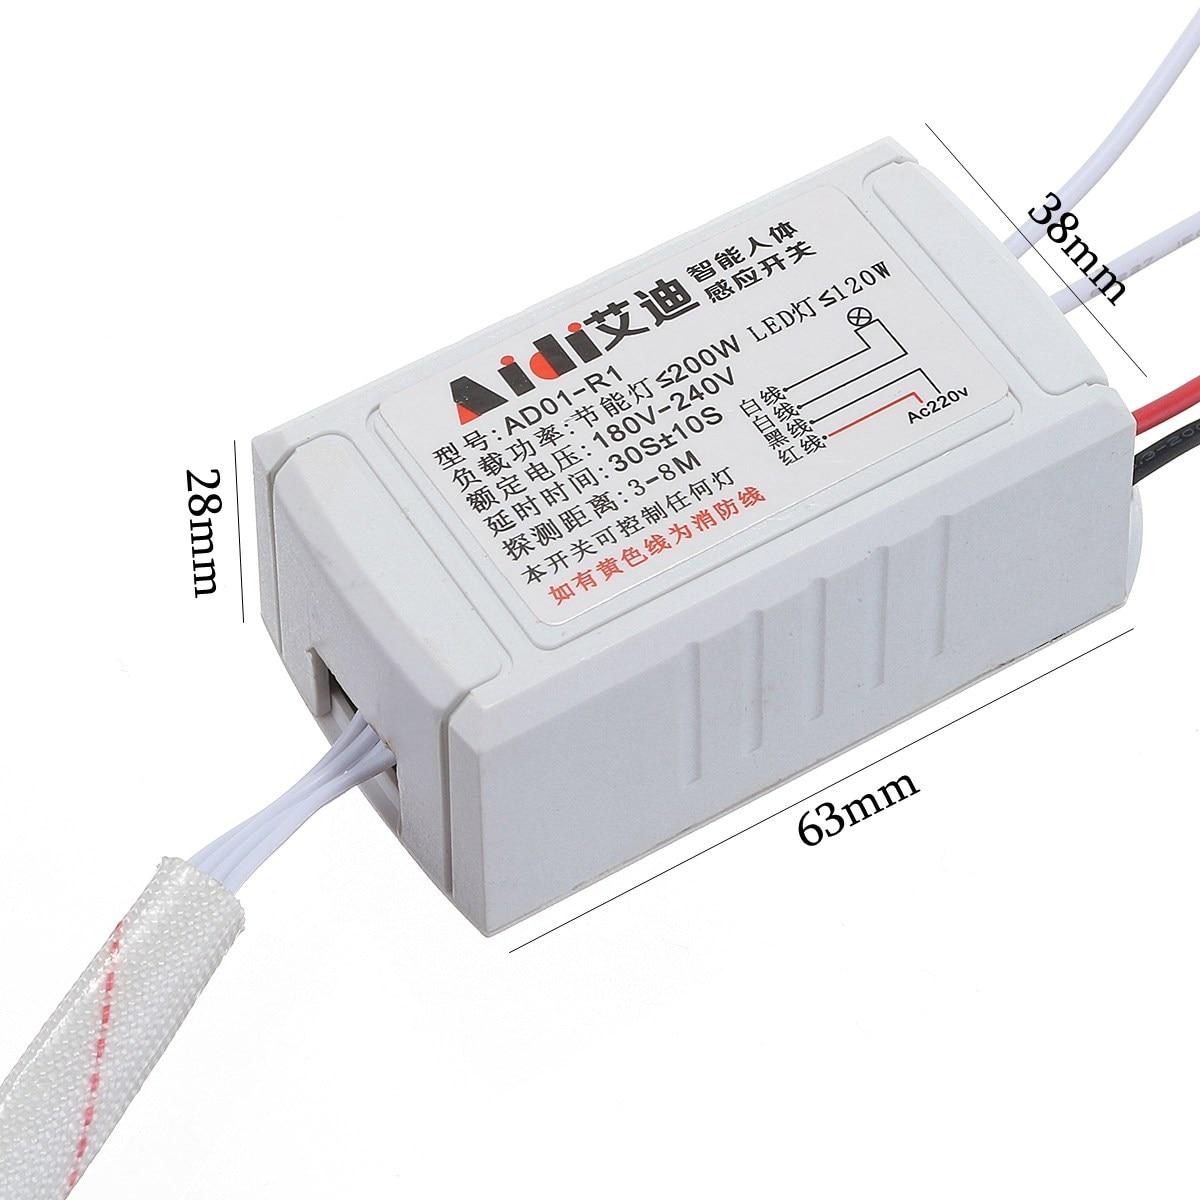 1 stück Neue Ankunft Automatische Glühbirne AC 220 v IR LED Streifen PIR Körper Infrarot Motion Sensor Schalter Sensoren